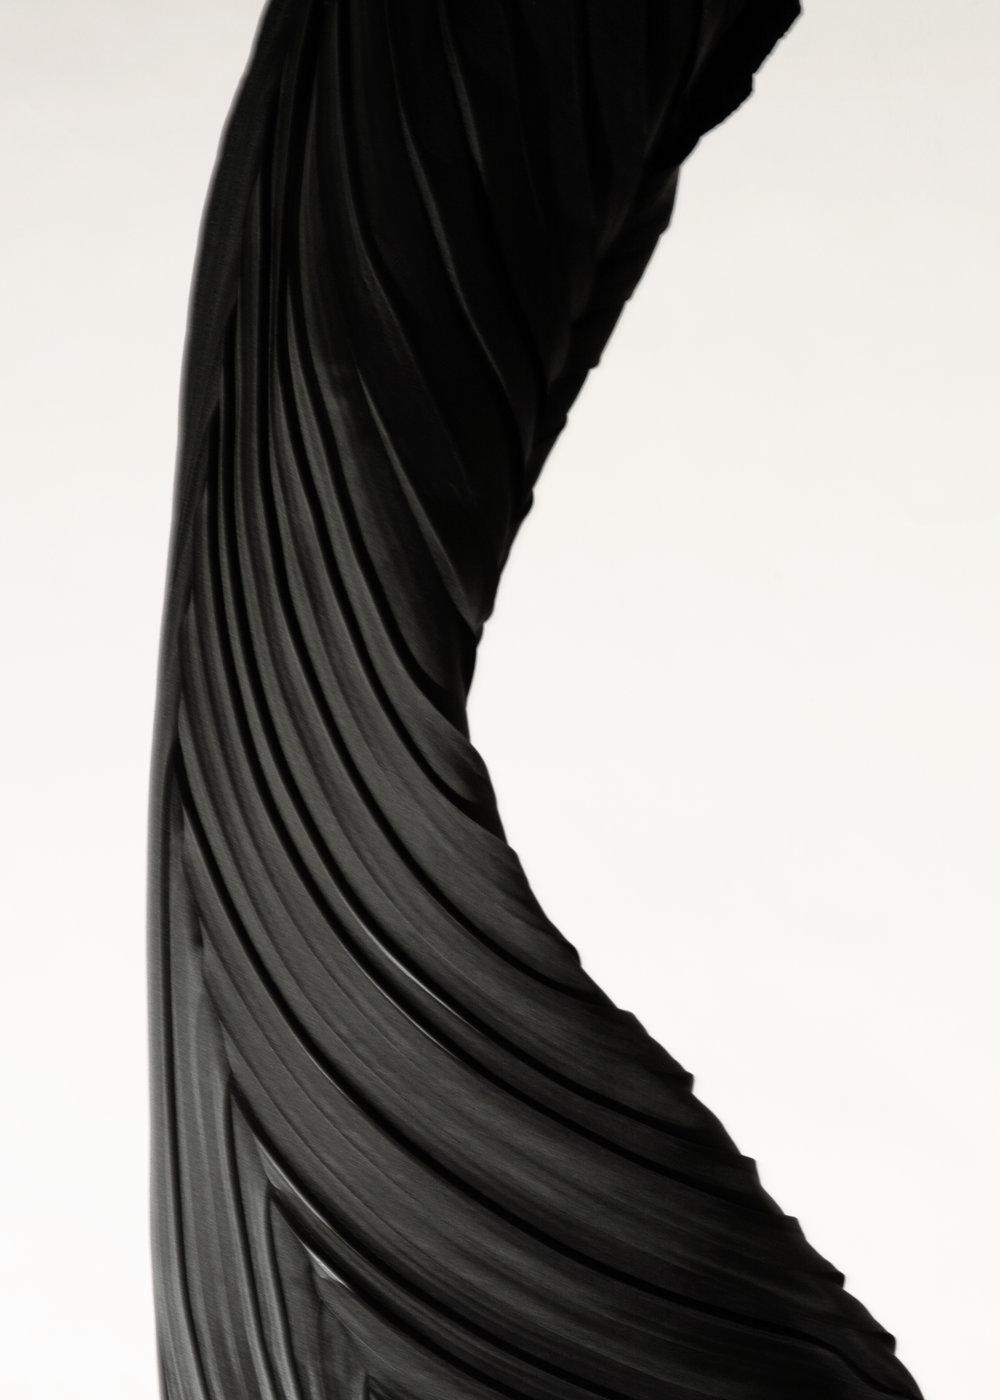 Totokaelo-FabricStory-7.jpg